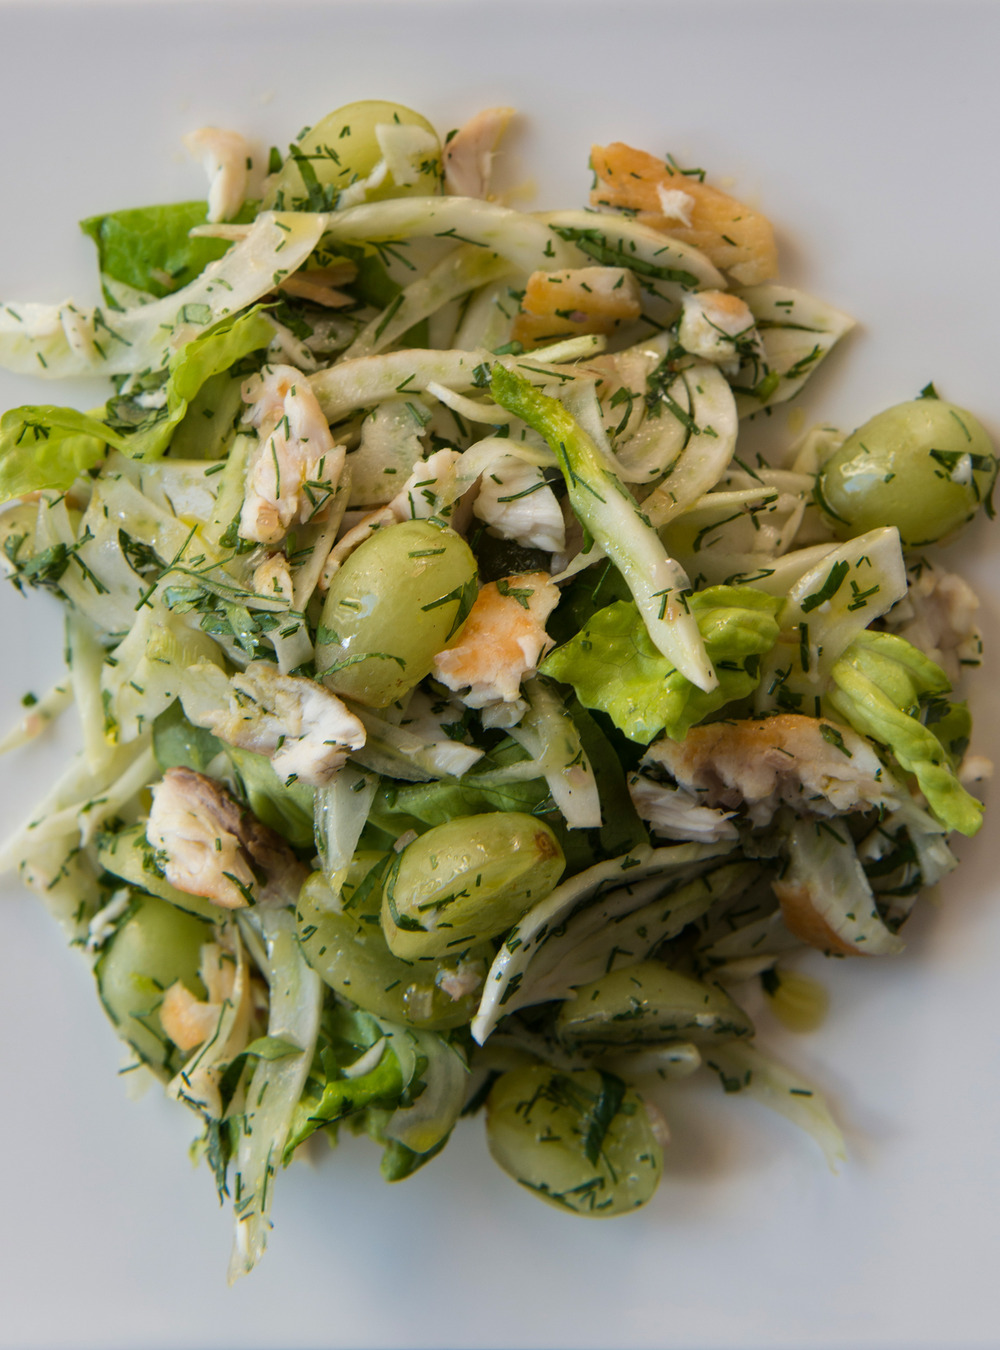 Salade tiède de fenouil, de raisins et de poisson   ricardo